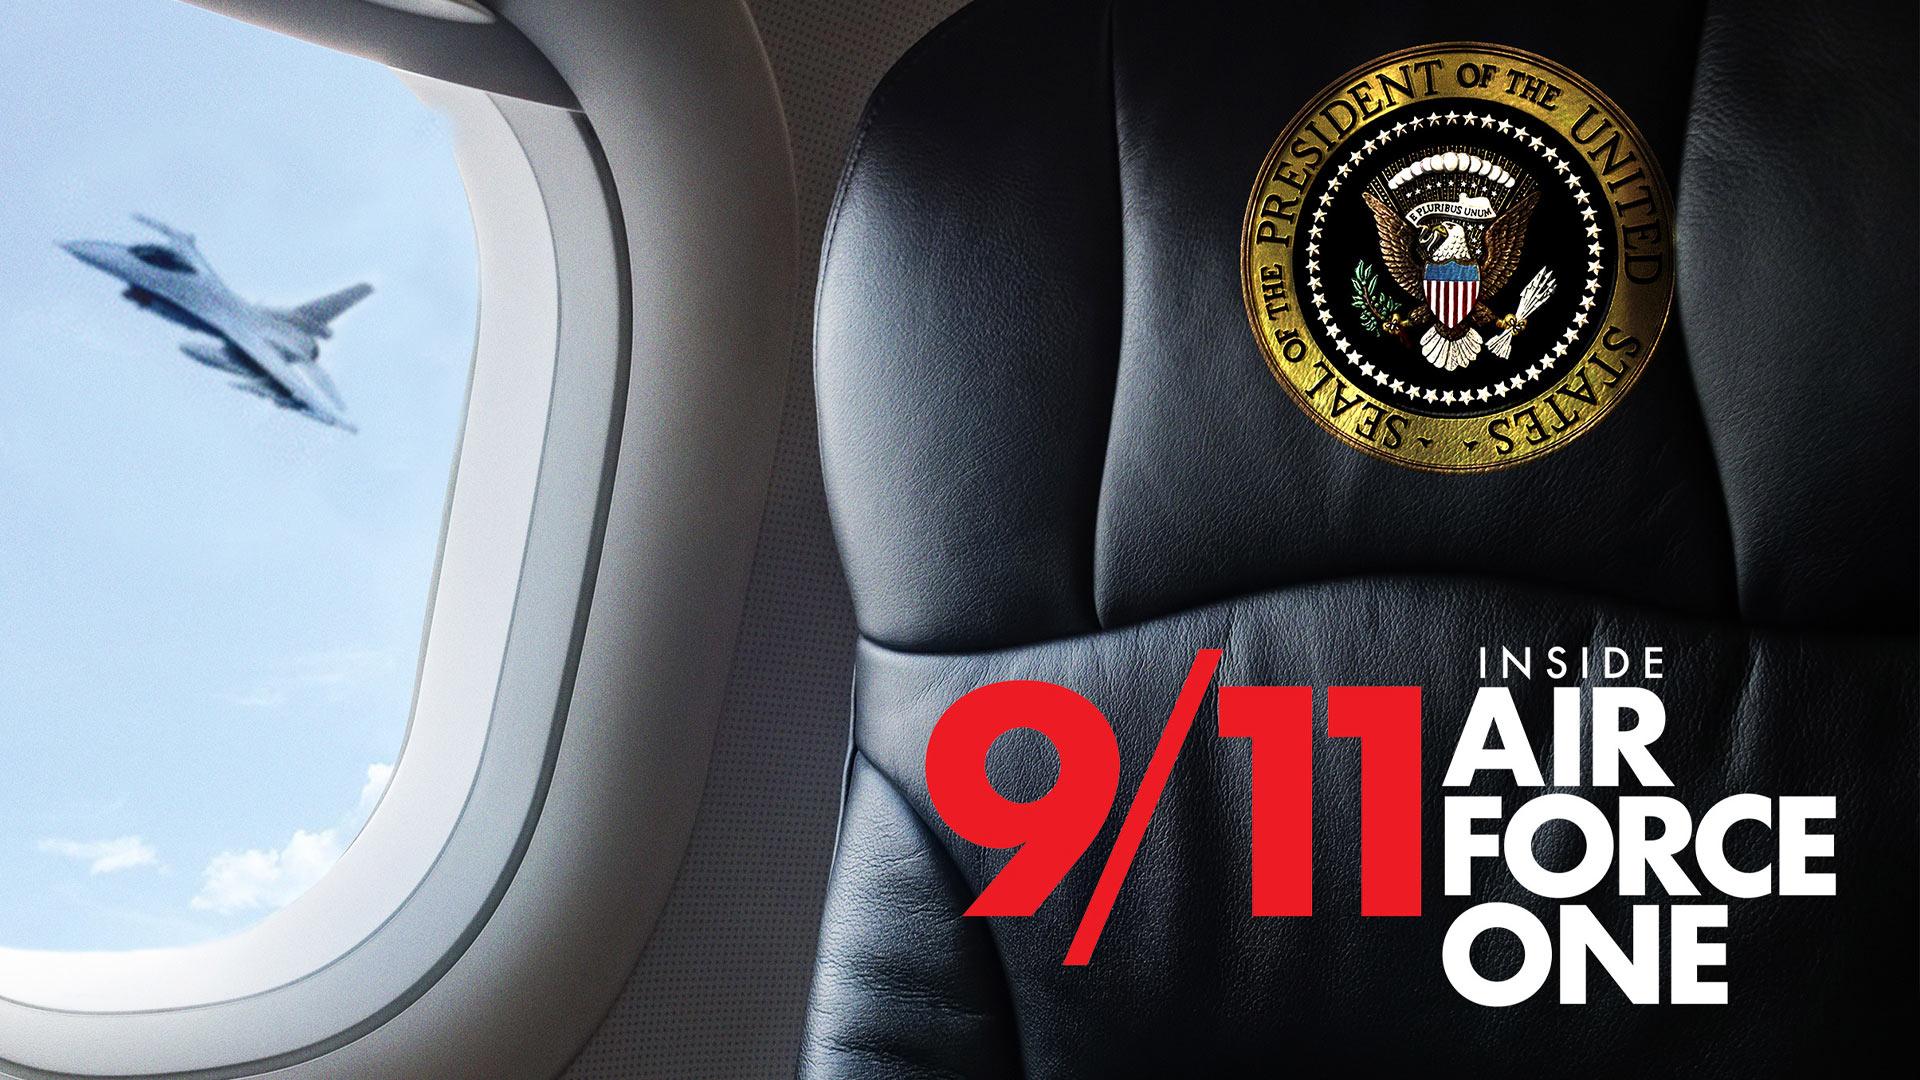 9/11: Inside Air Force One Season 1